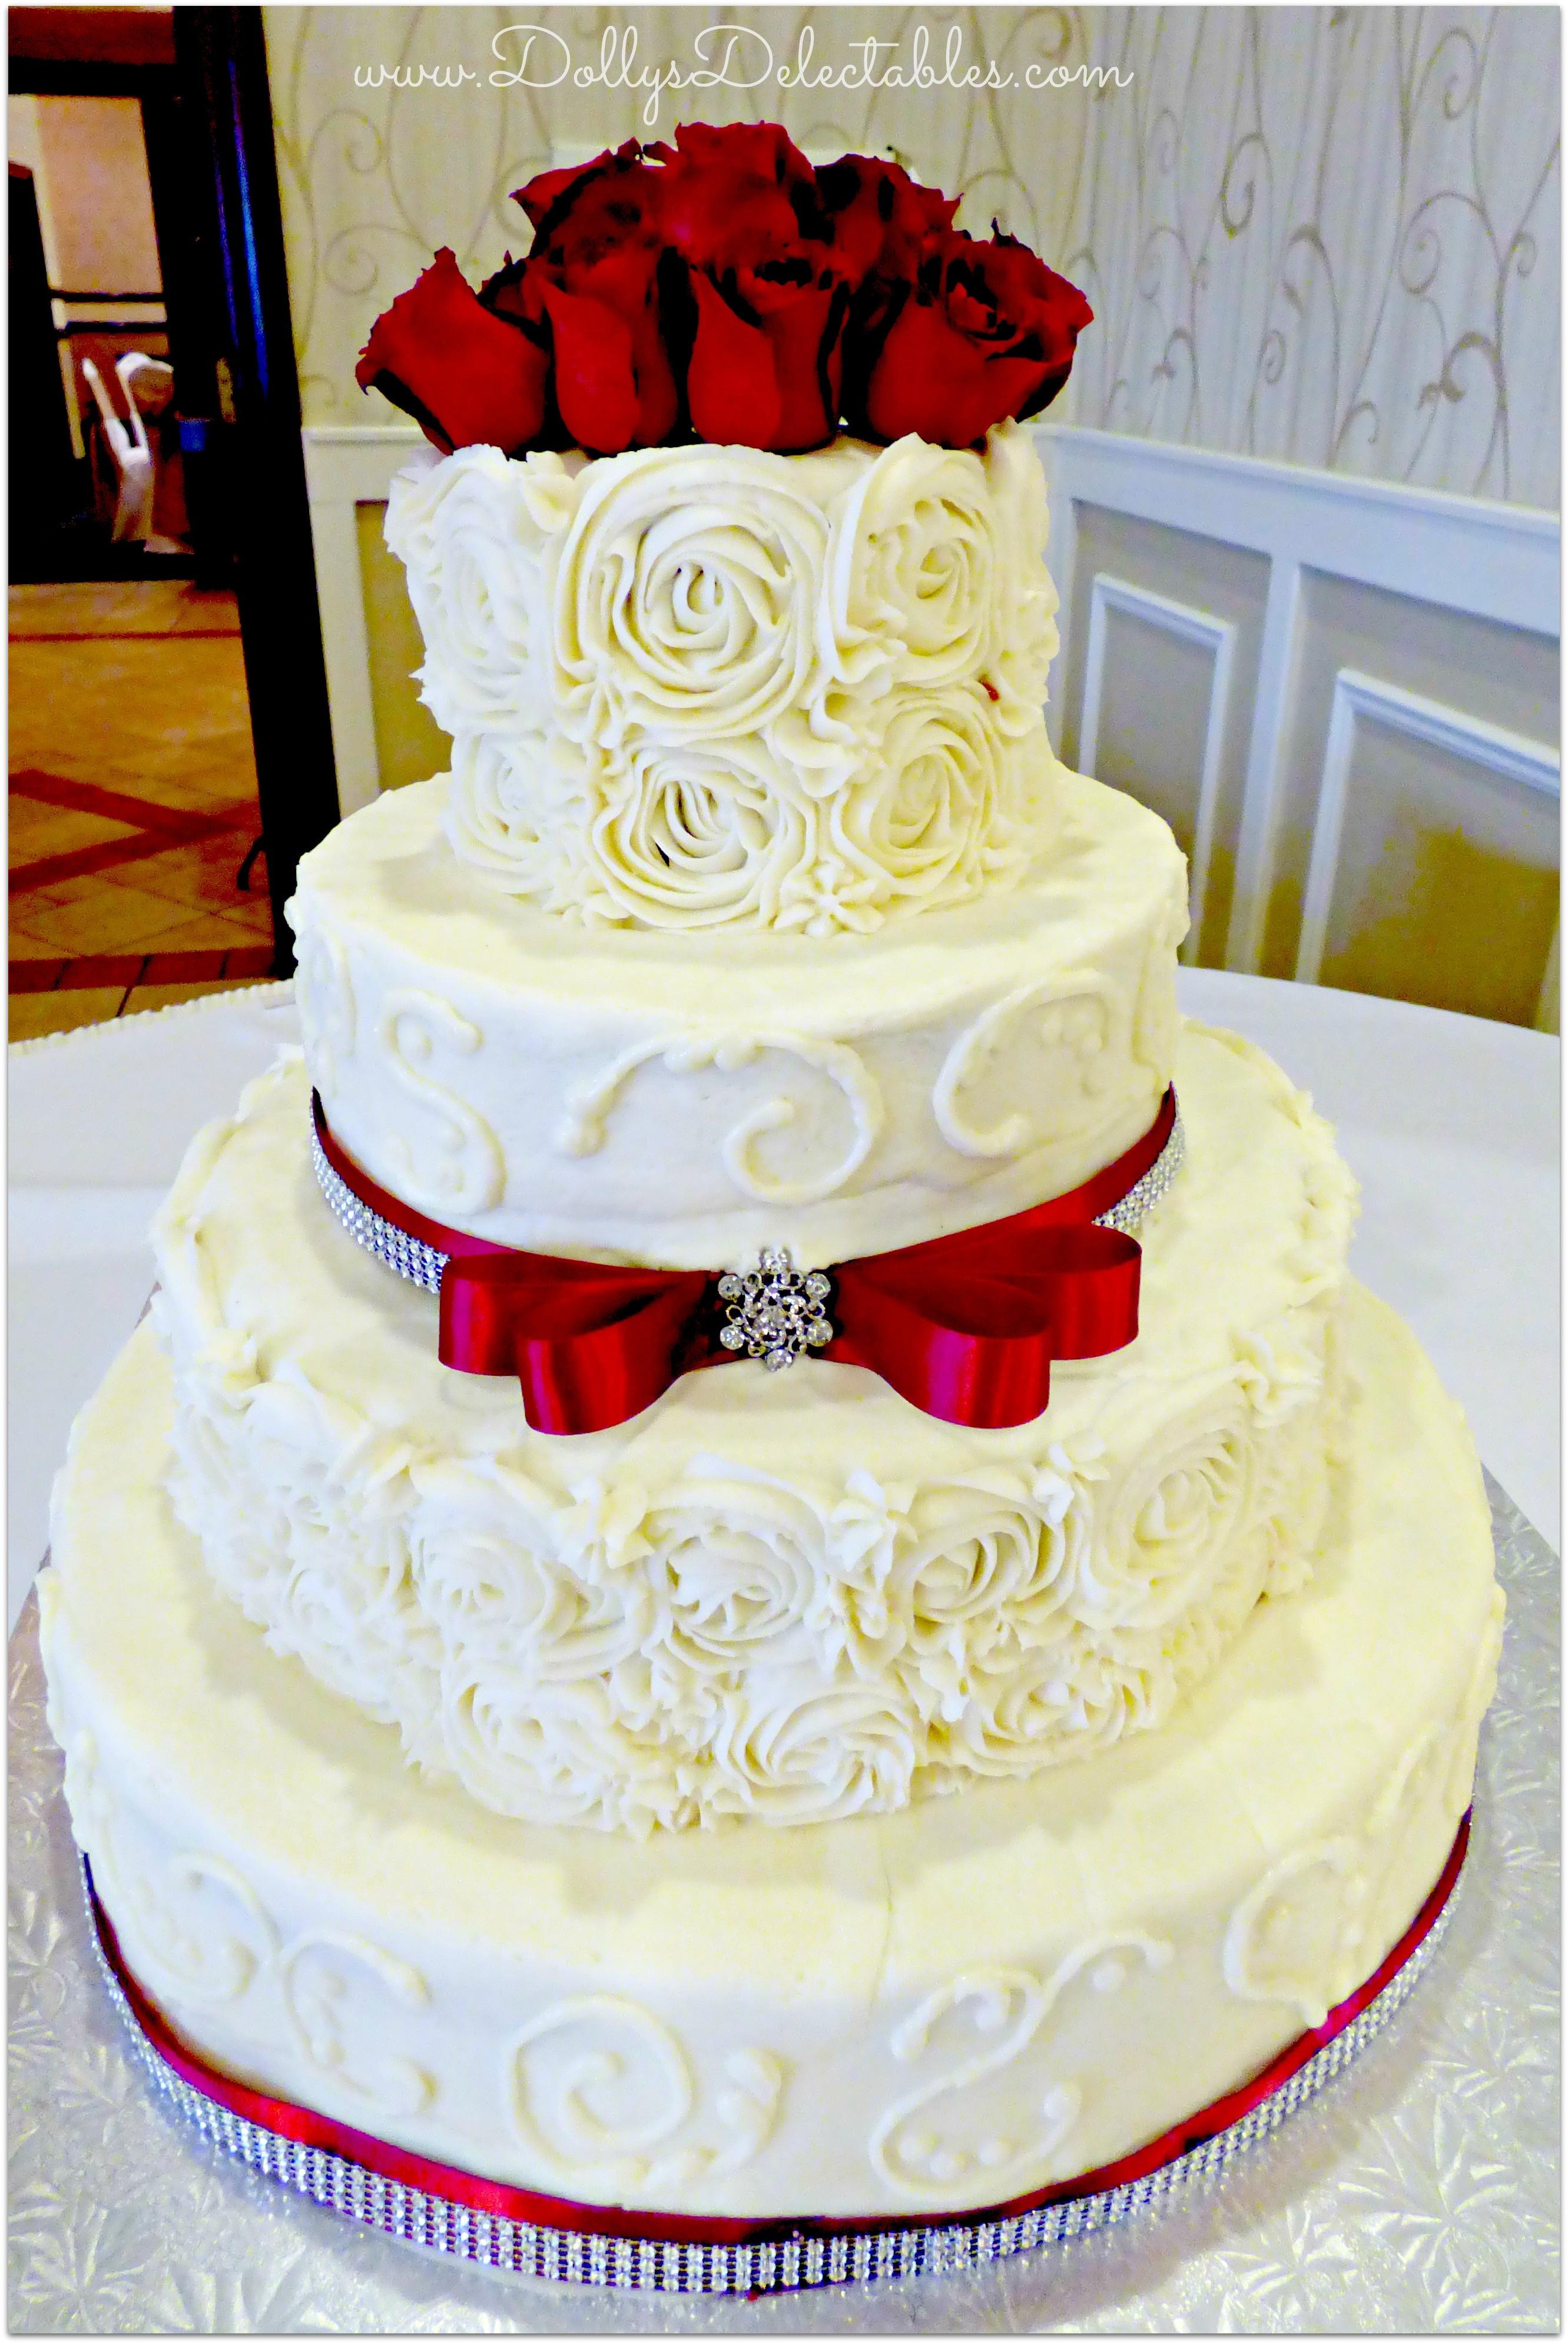 Non Fondant Wedding Cakes  Non Fondant Wedding Cakes